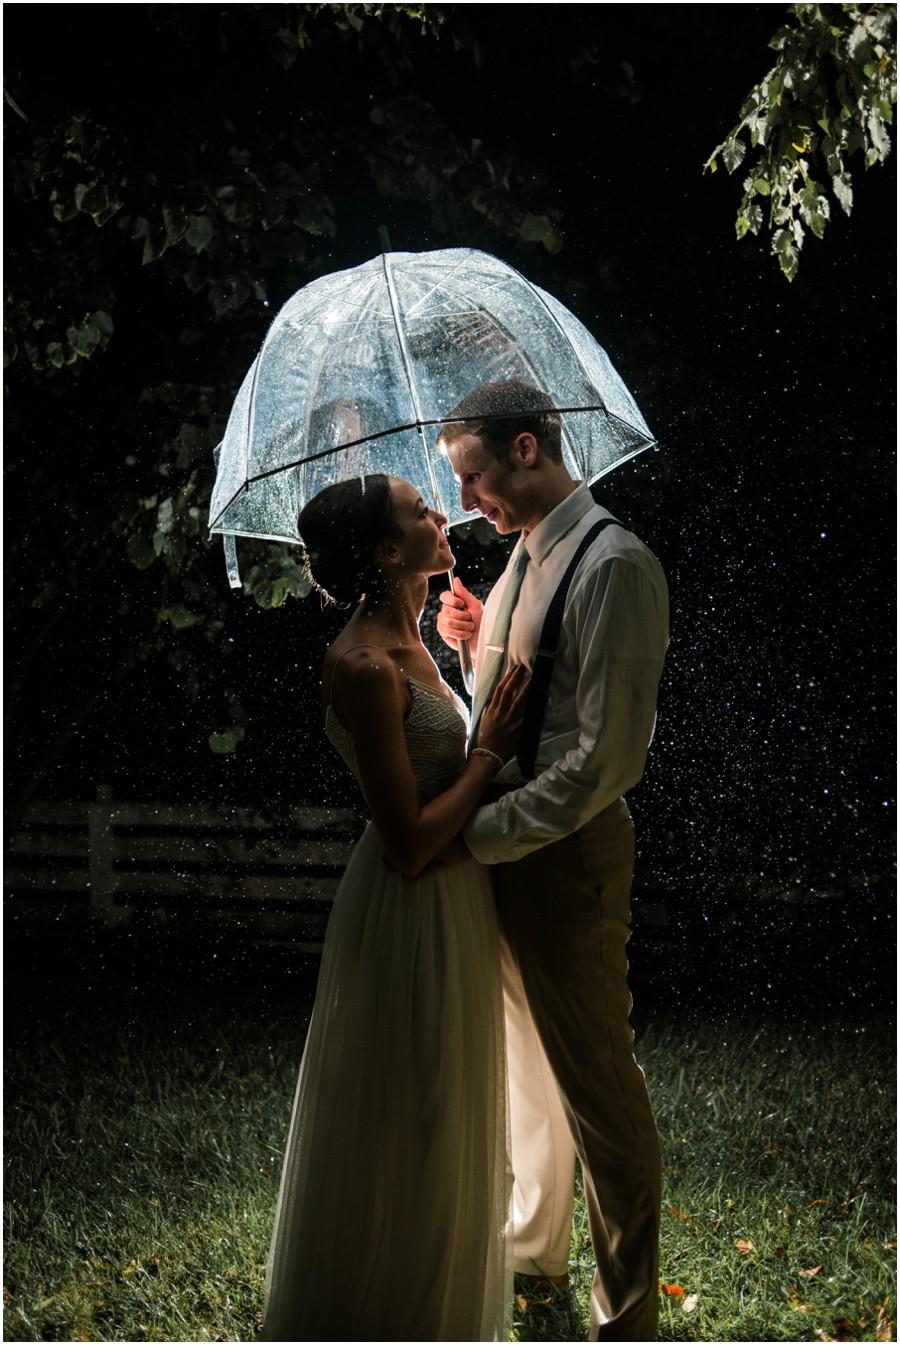 Bohemian-Howard-County-Conservancy-Wedding-Chelsea-Blanch-Photography-24